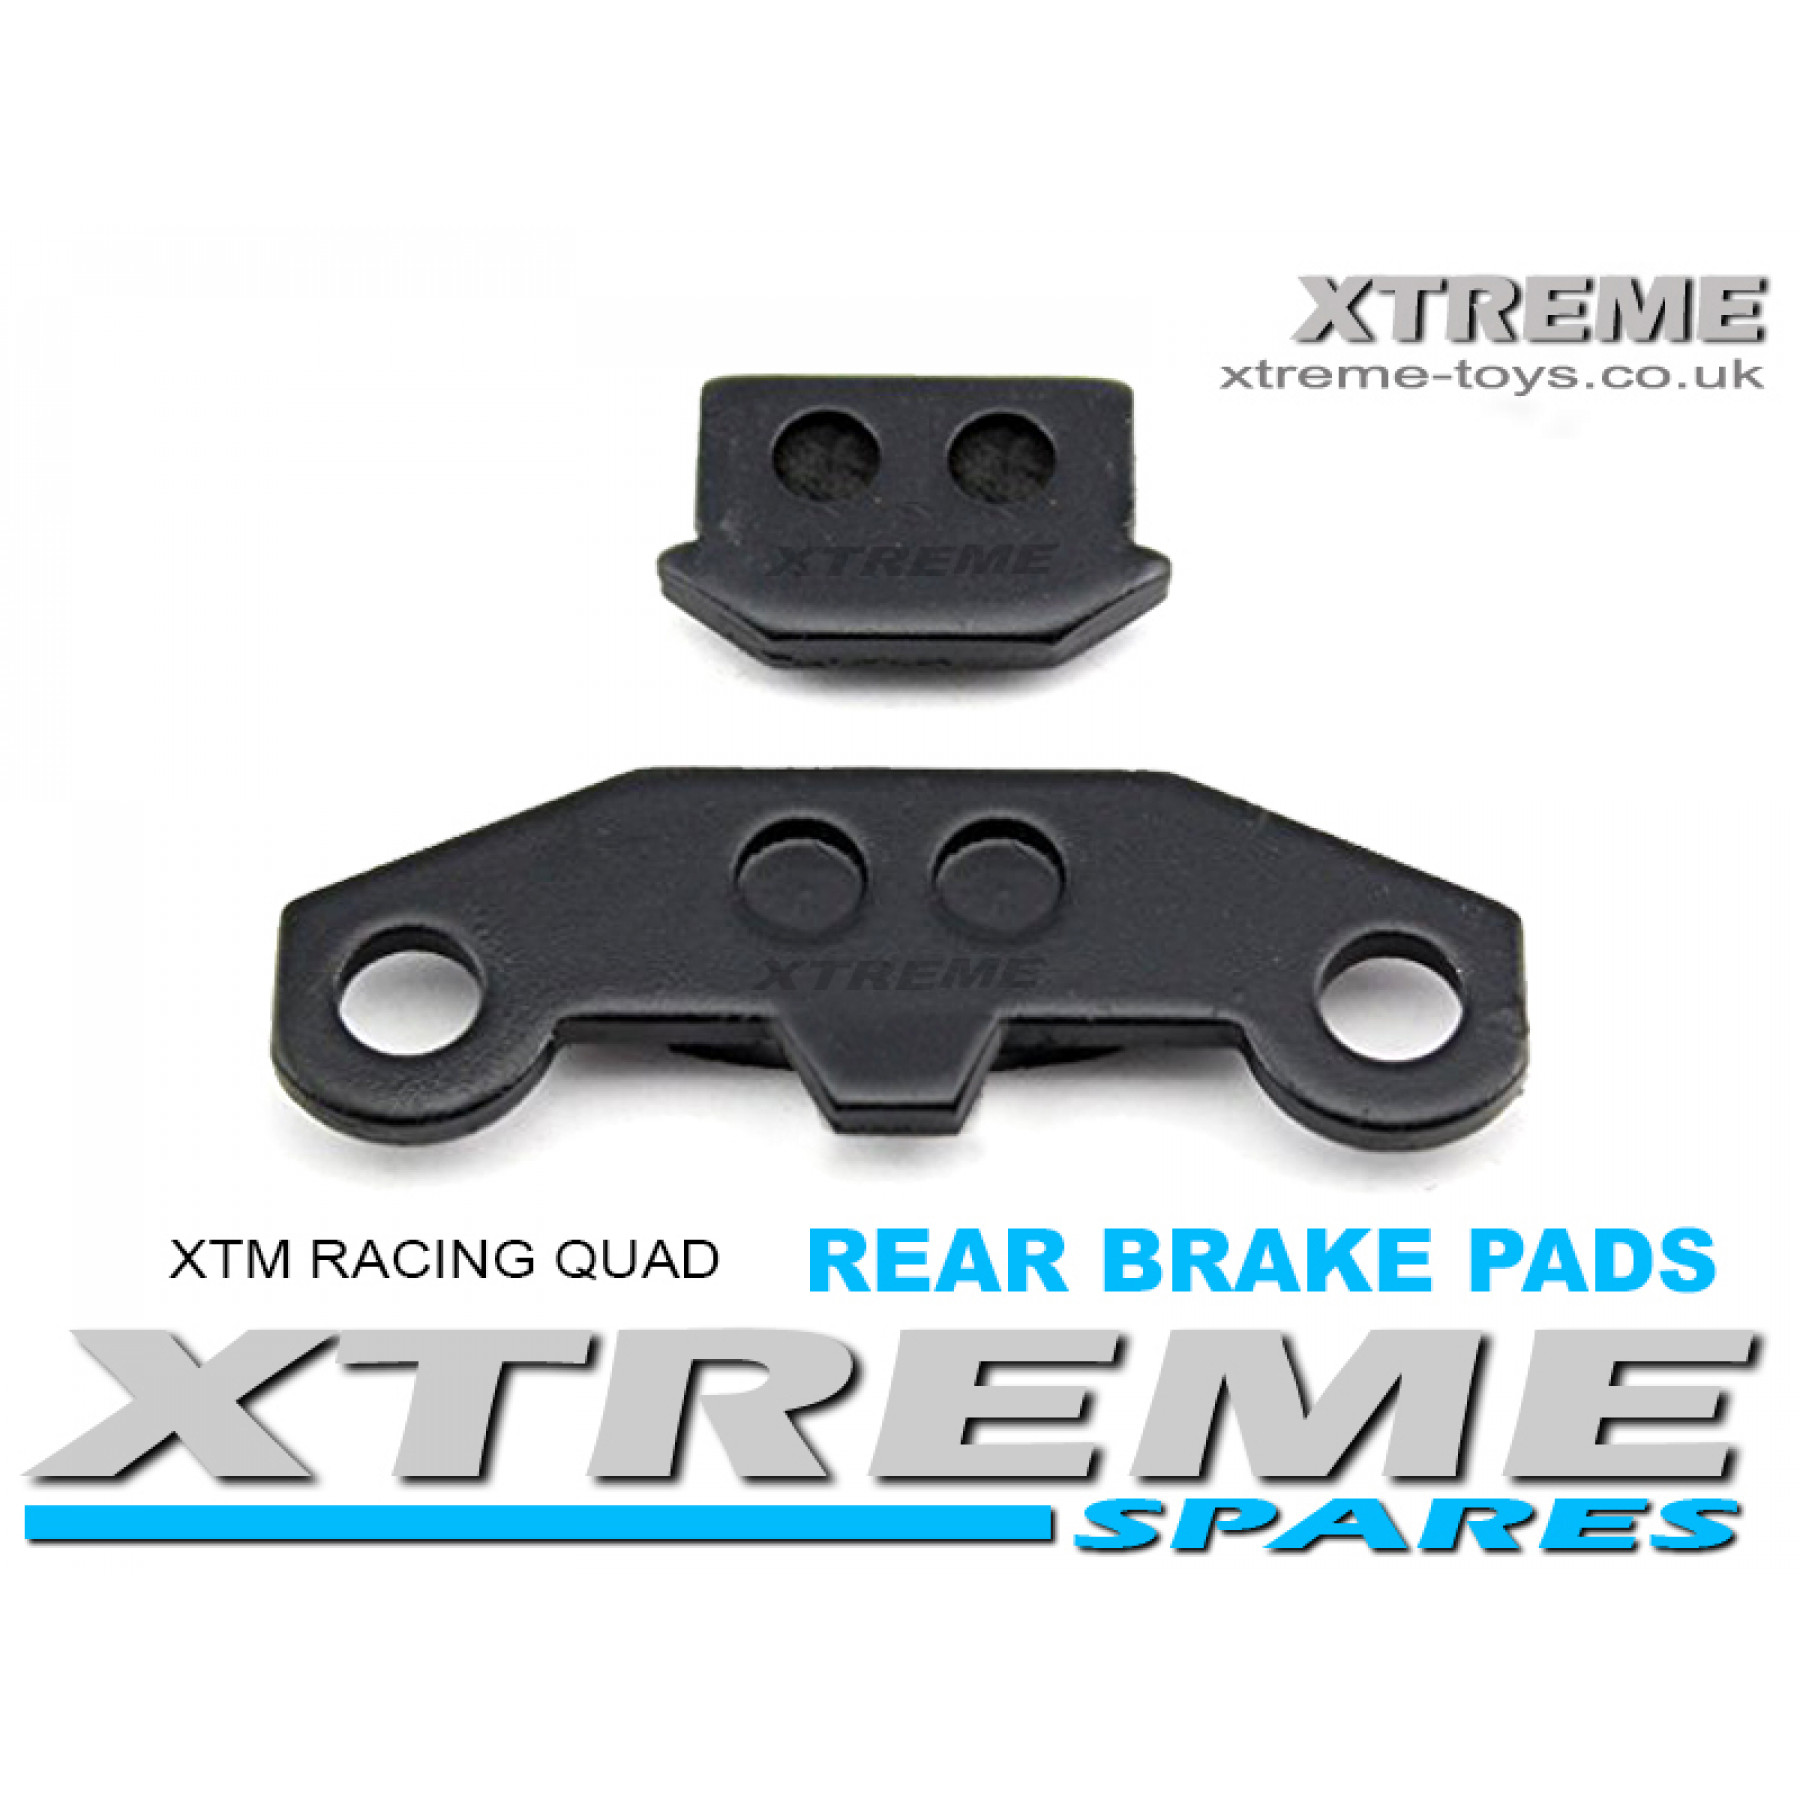 XTM RACING QUAD COMPLETE REAR BRAKE PADS